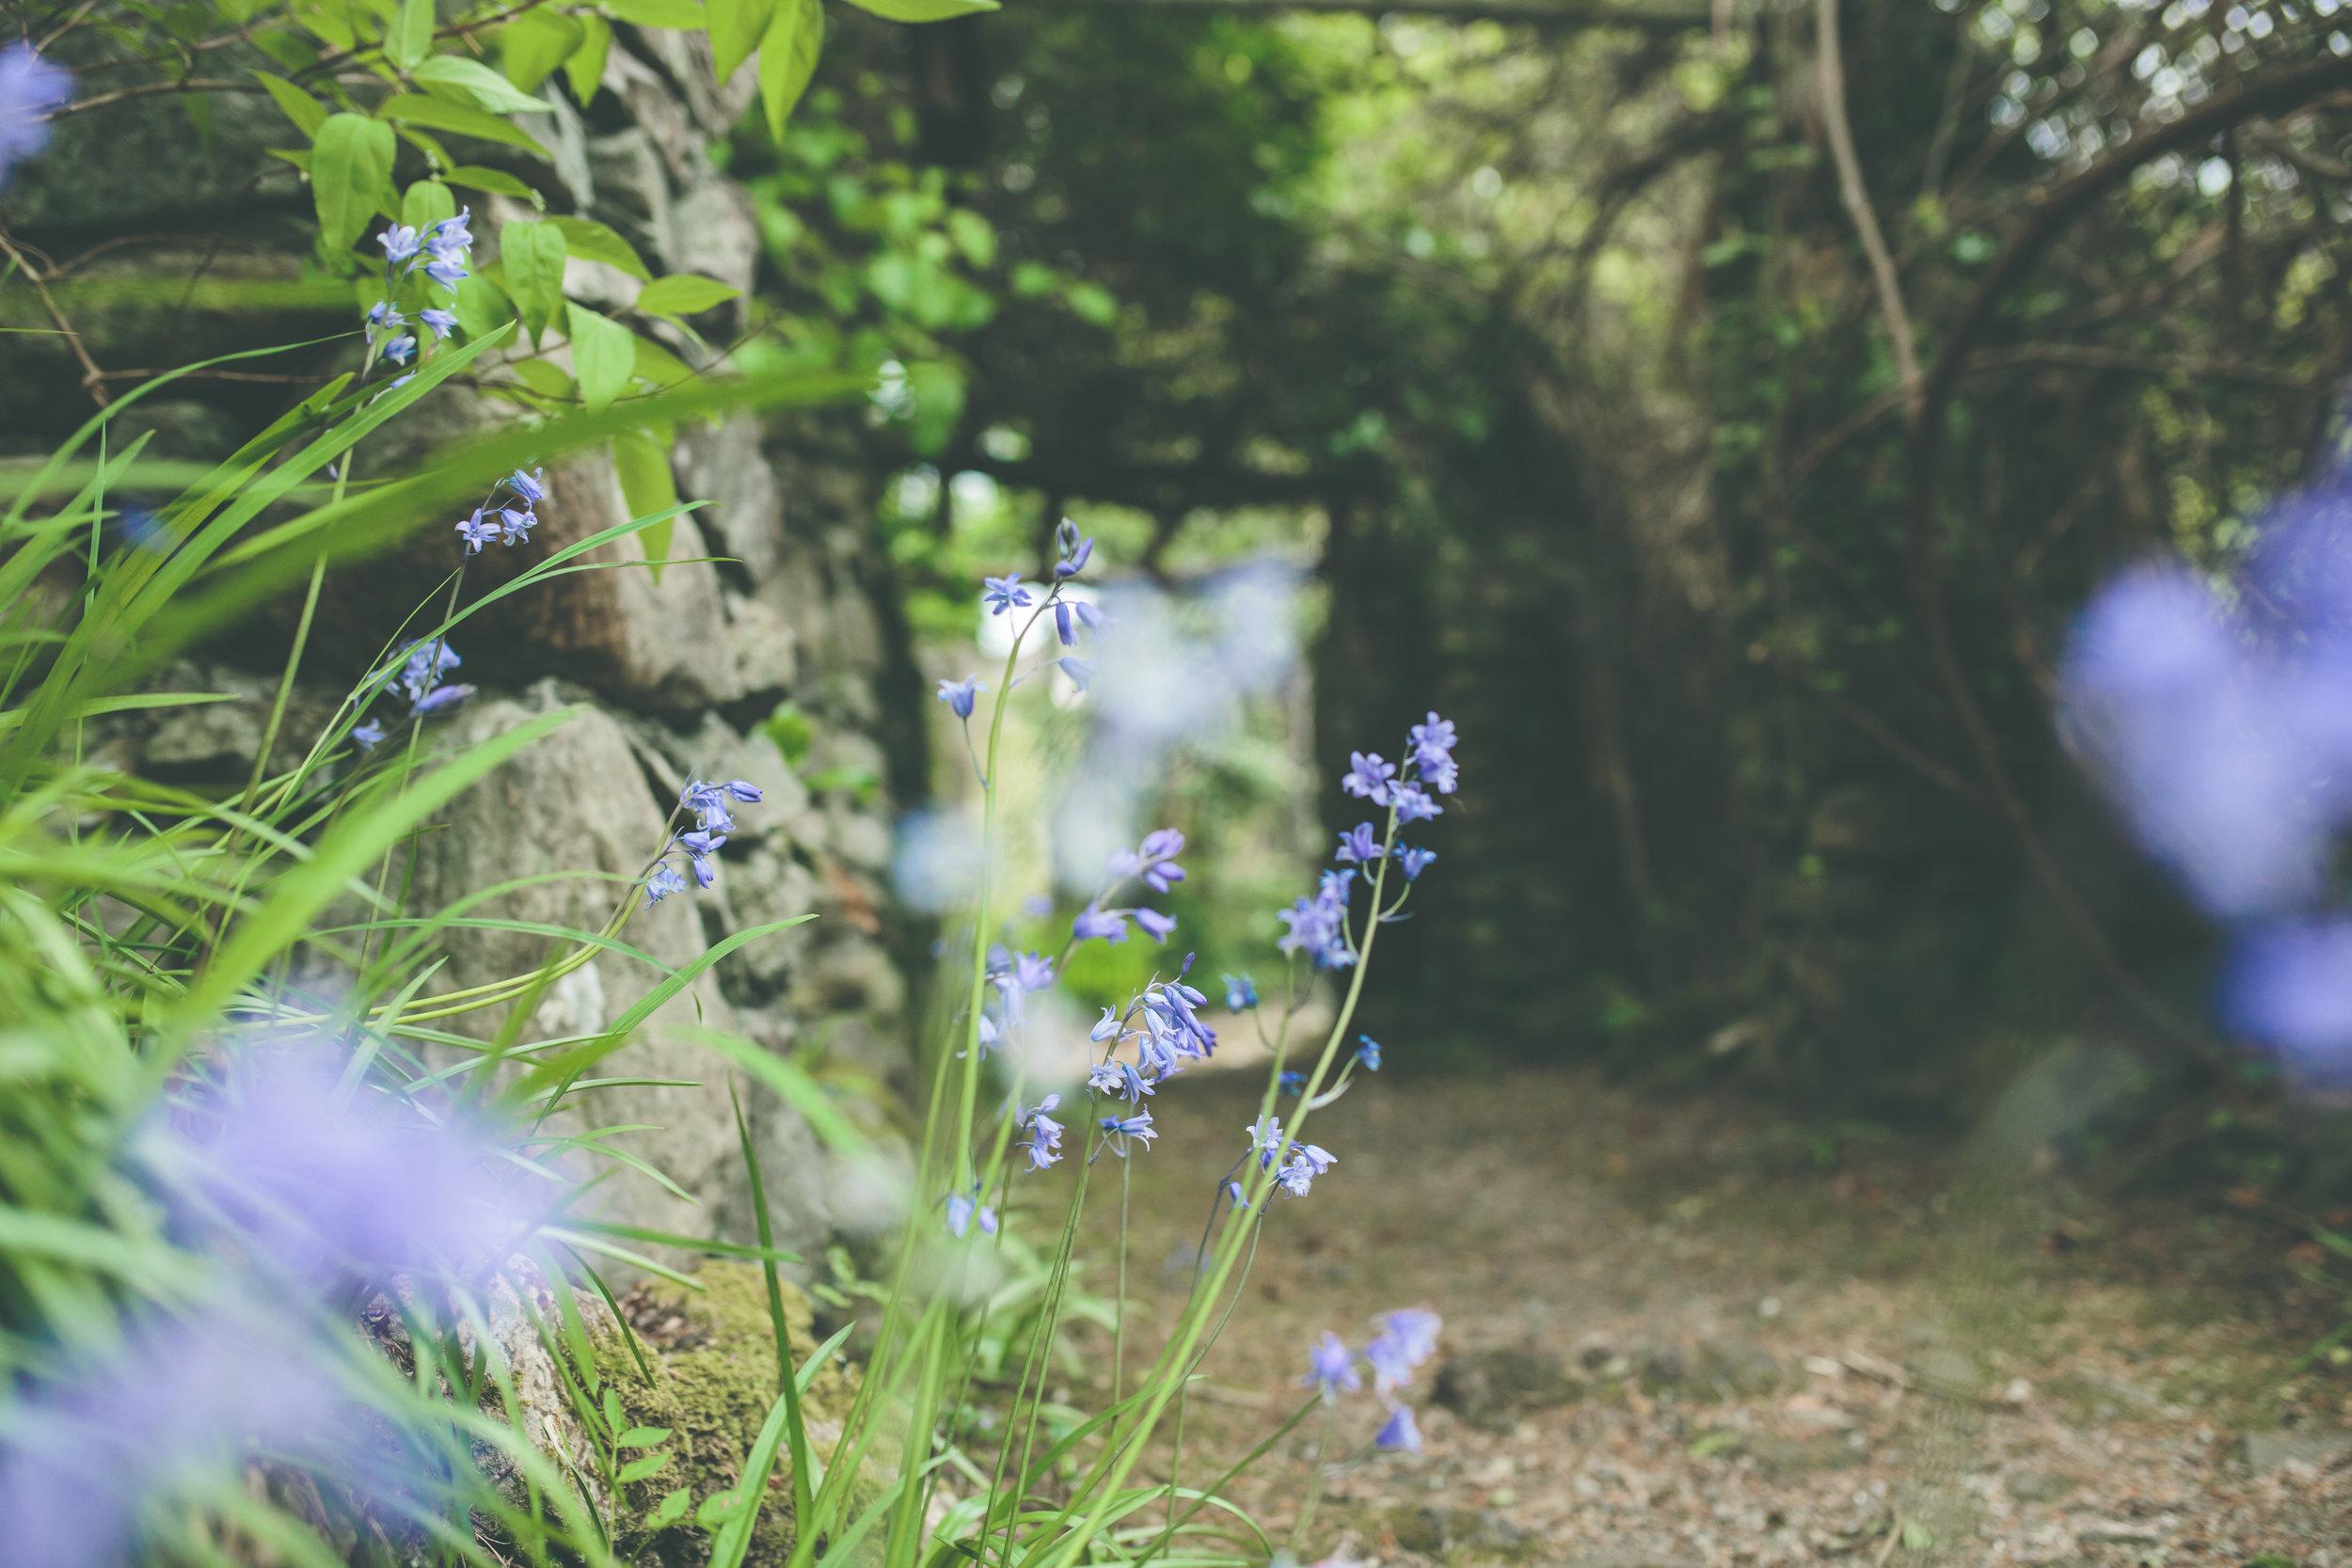 Bluebells by Shropshire wedding photographer in Ireland